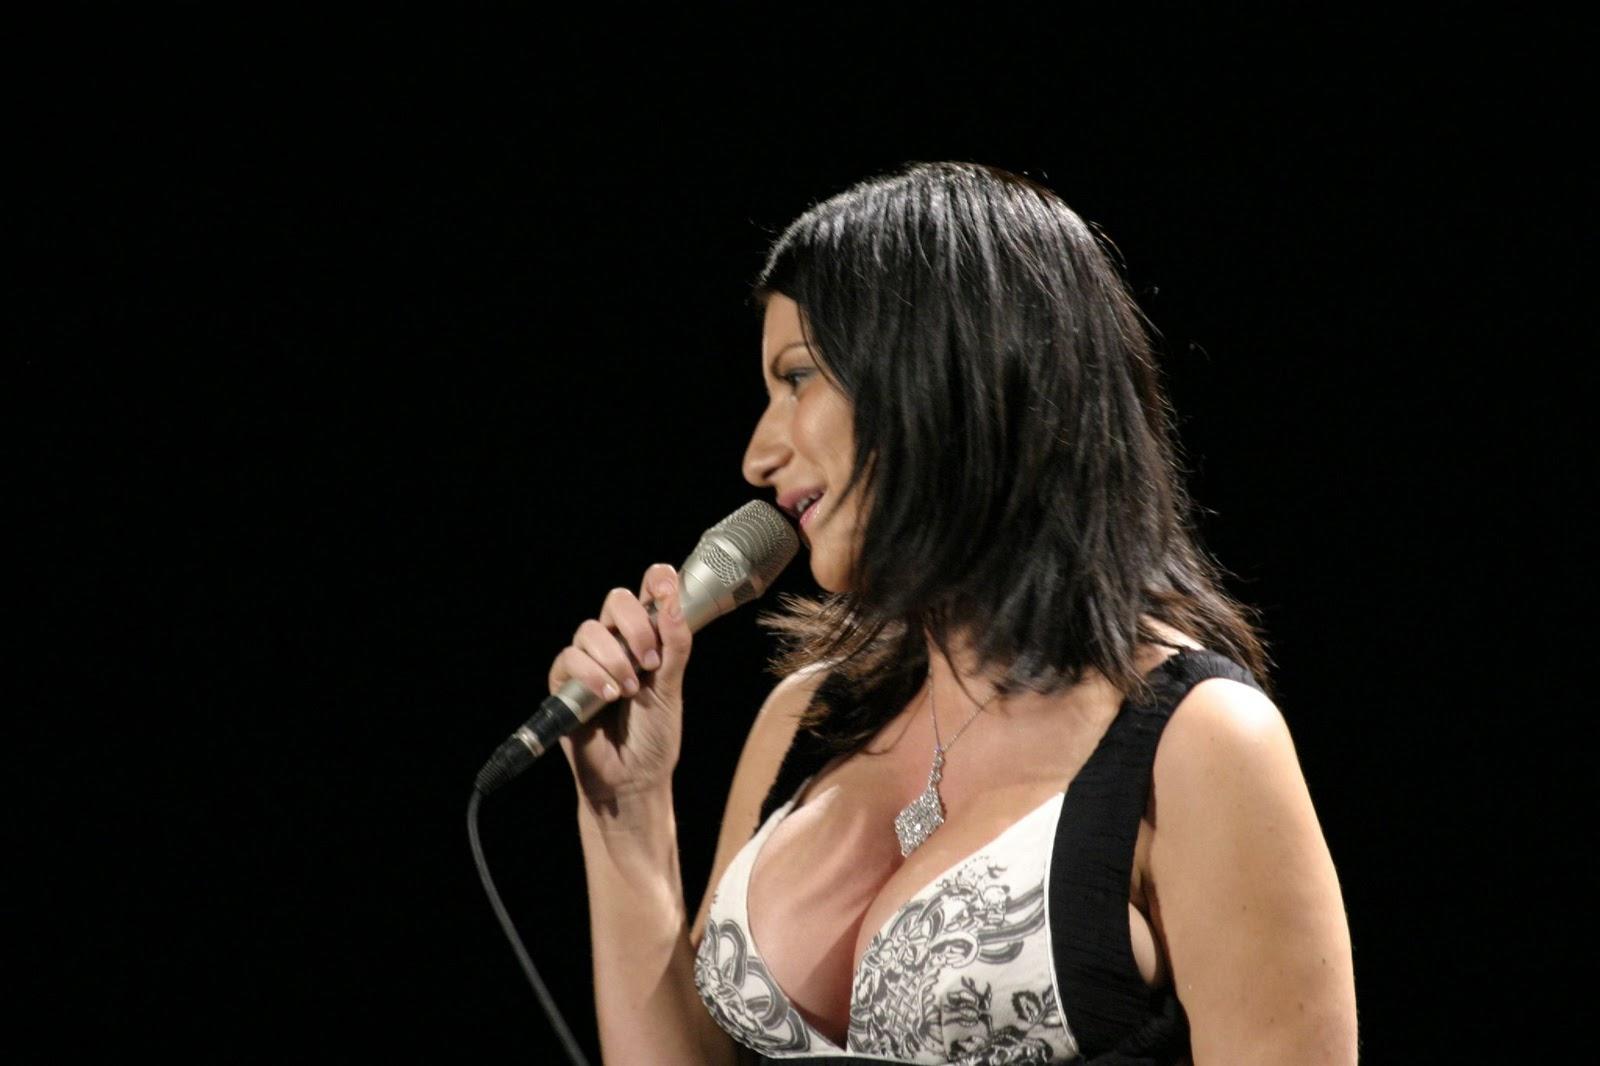 Big Breast Girls: Laura Pausini, real big natural breast.: bigbreastgirls.blogspot.com/2010/12/laura-pausini-real-big-natural...